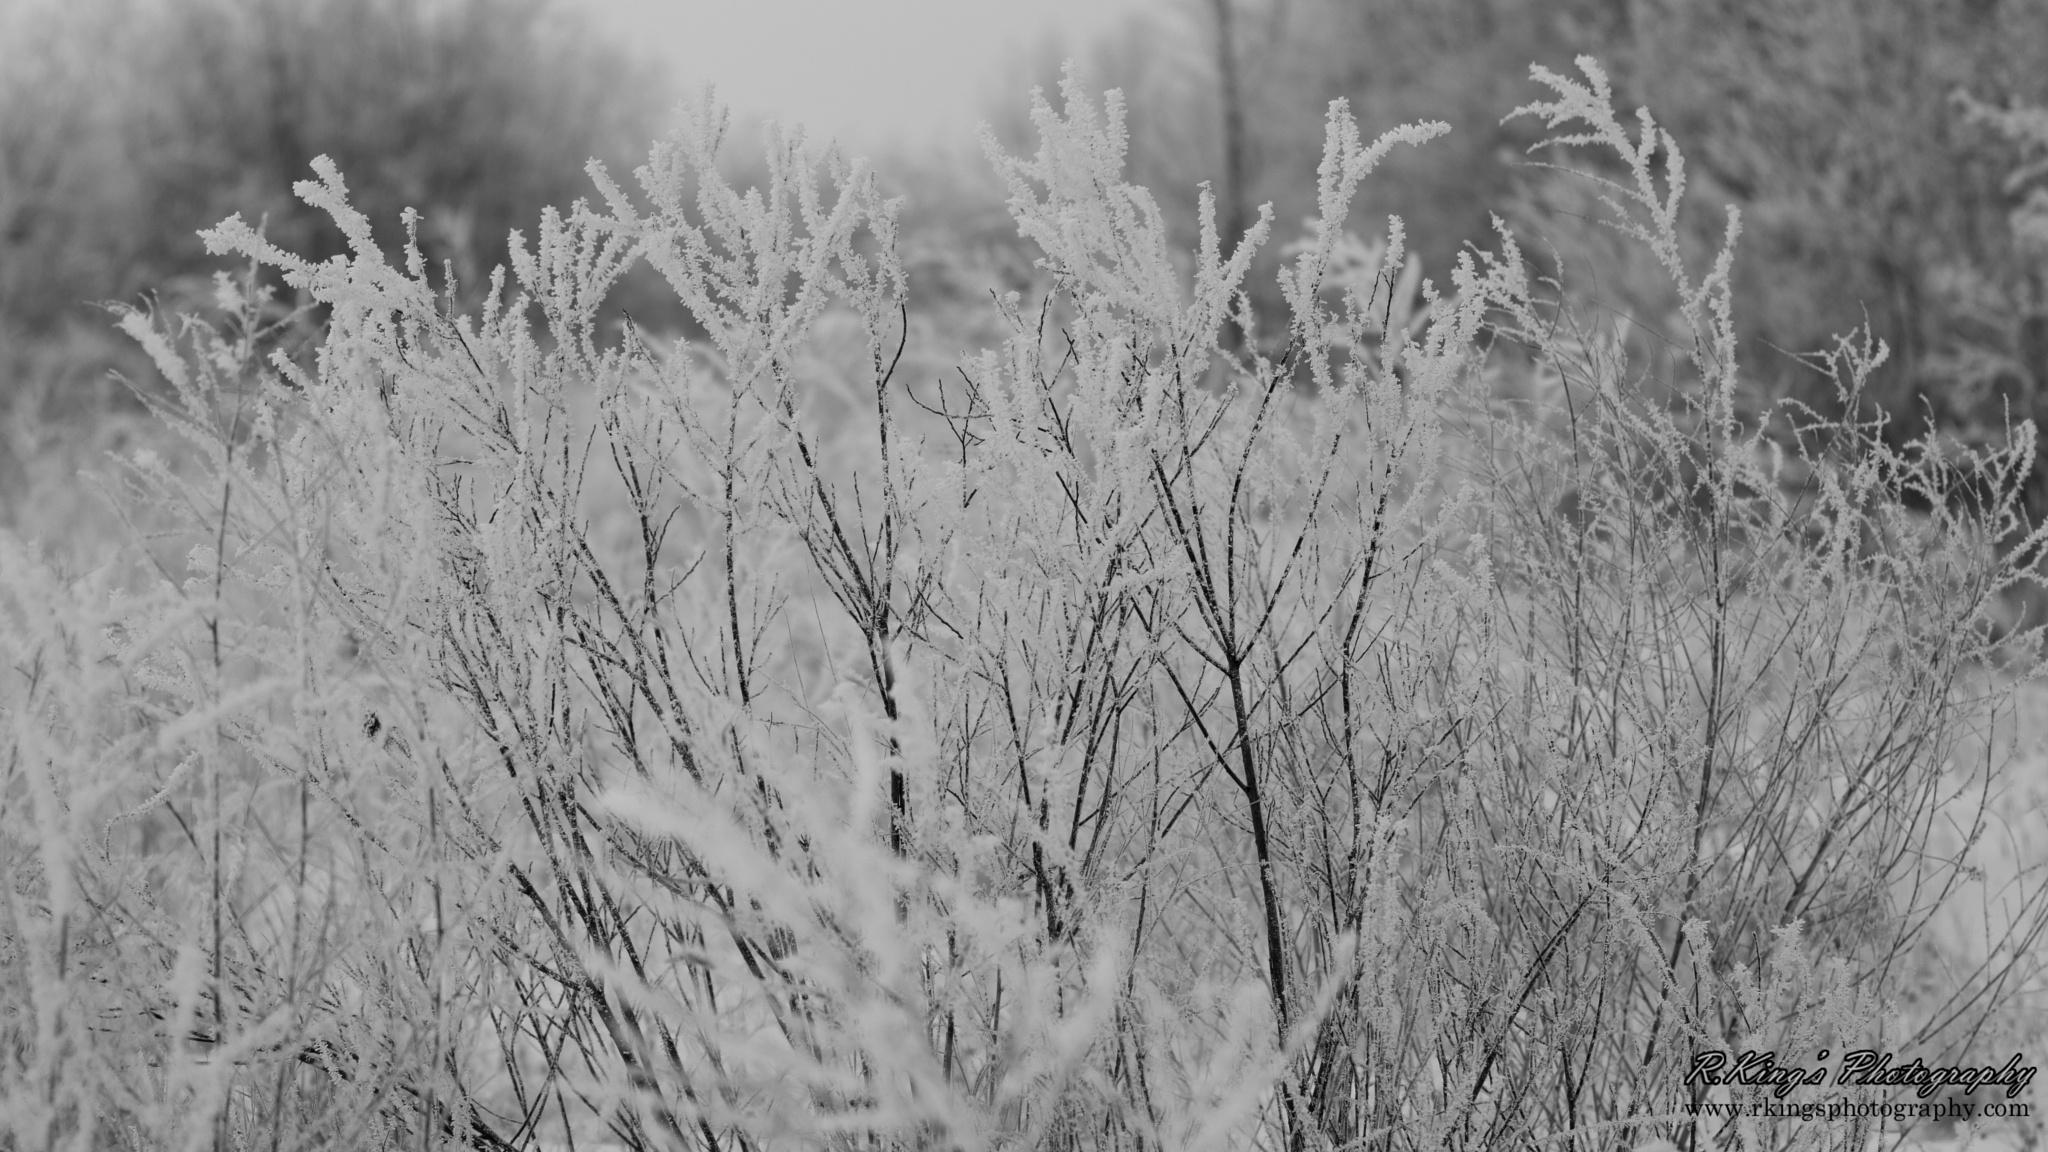 Grey days of winter by Rodney_King